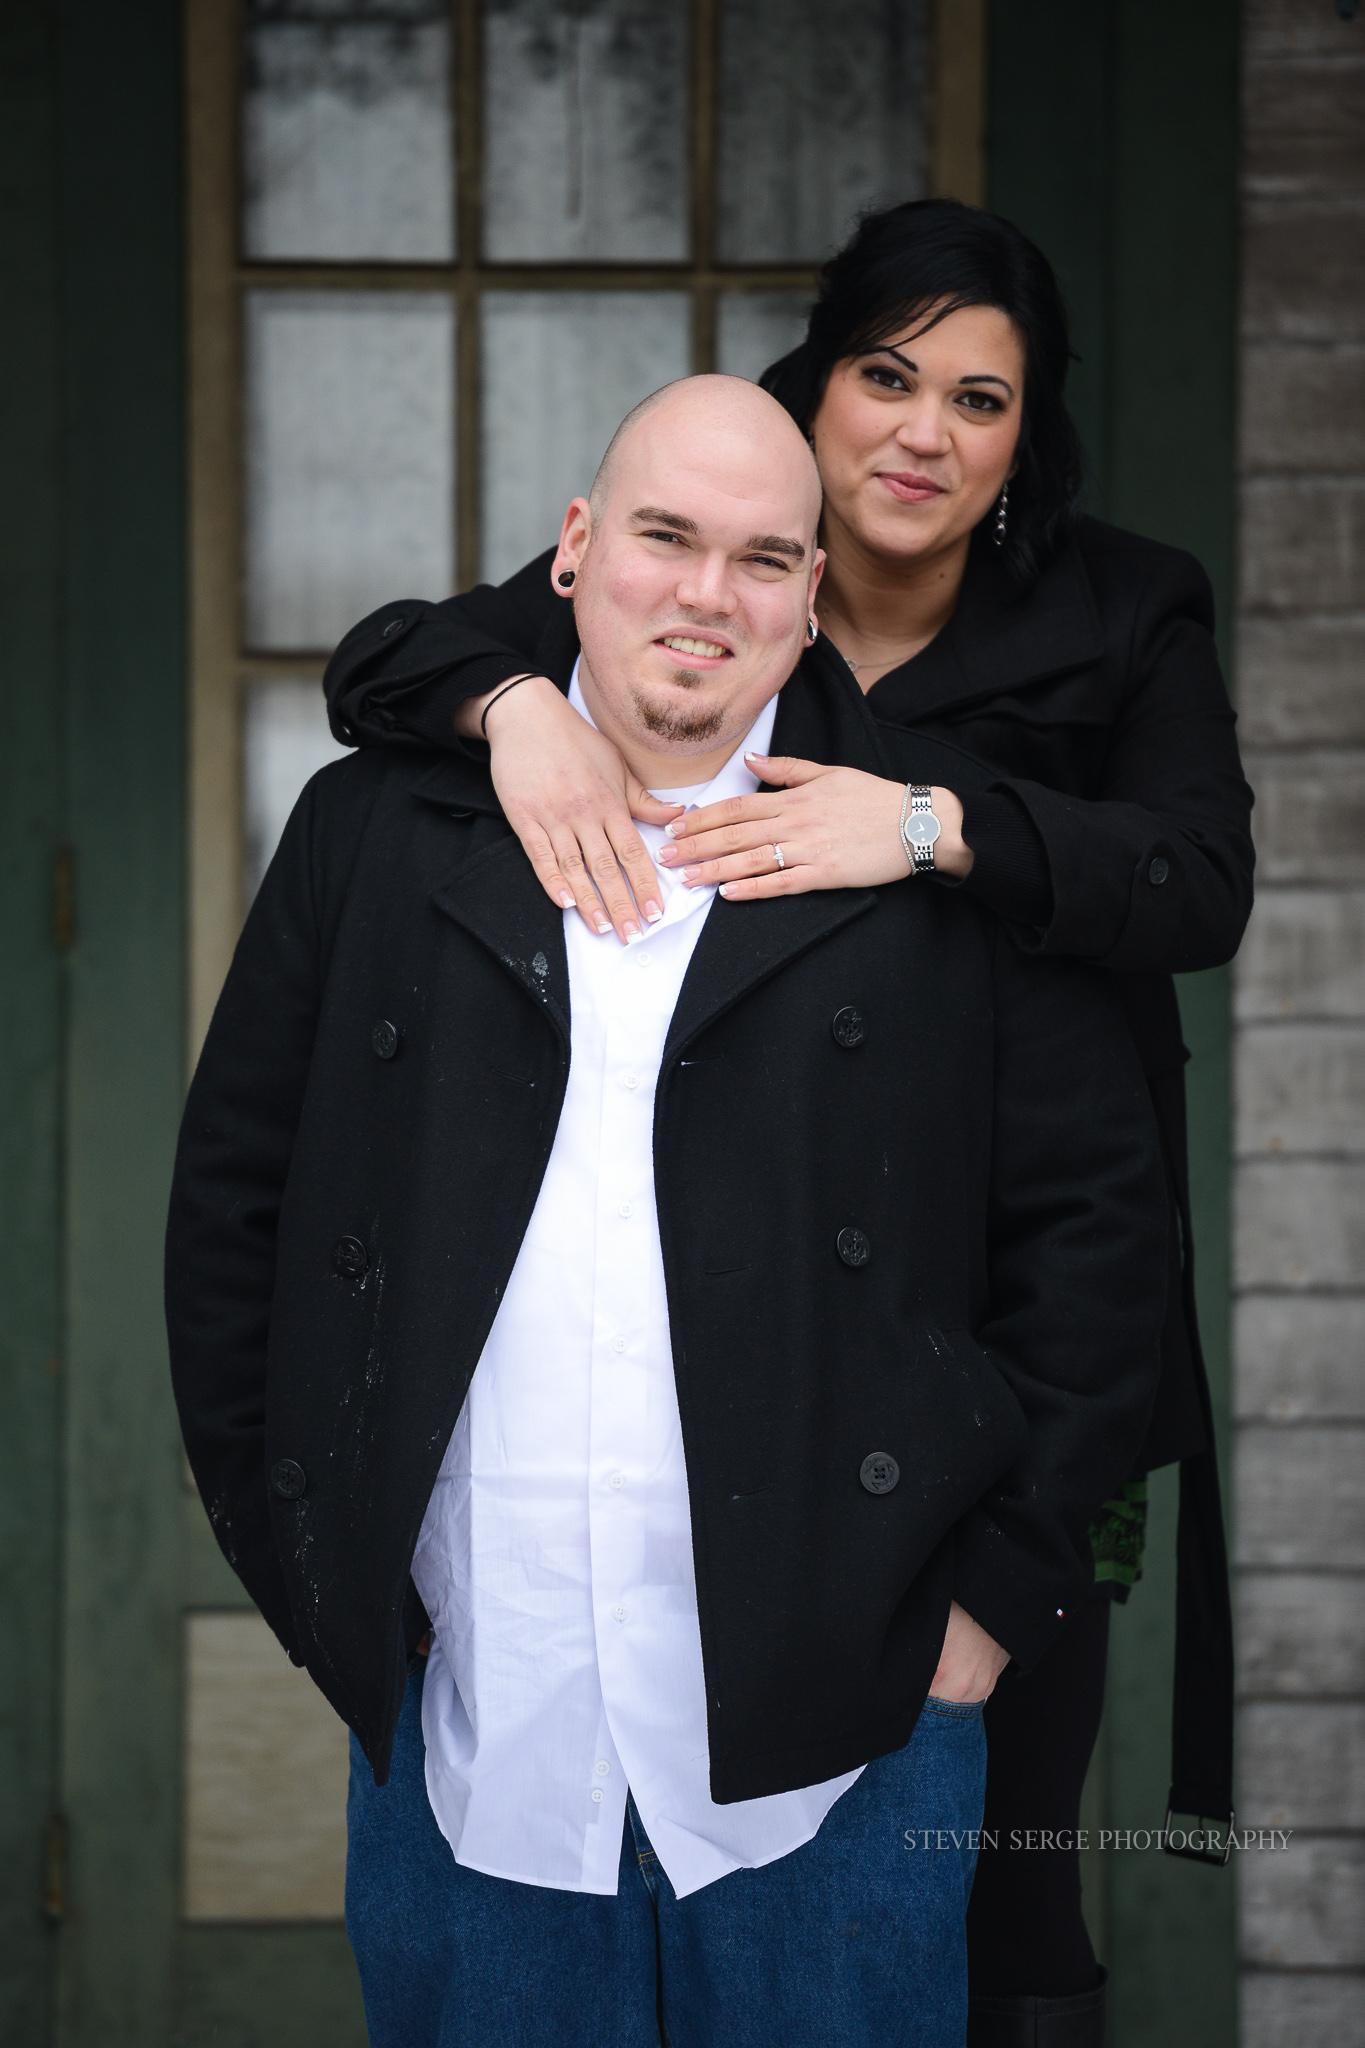 Rosa-NEPA-Wedding-Engagement-Photographer-Waverly-Clarks-Summit-Scranton-Photographer-11.jpg